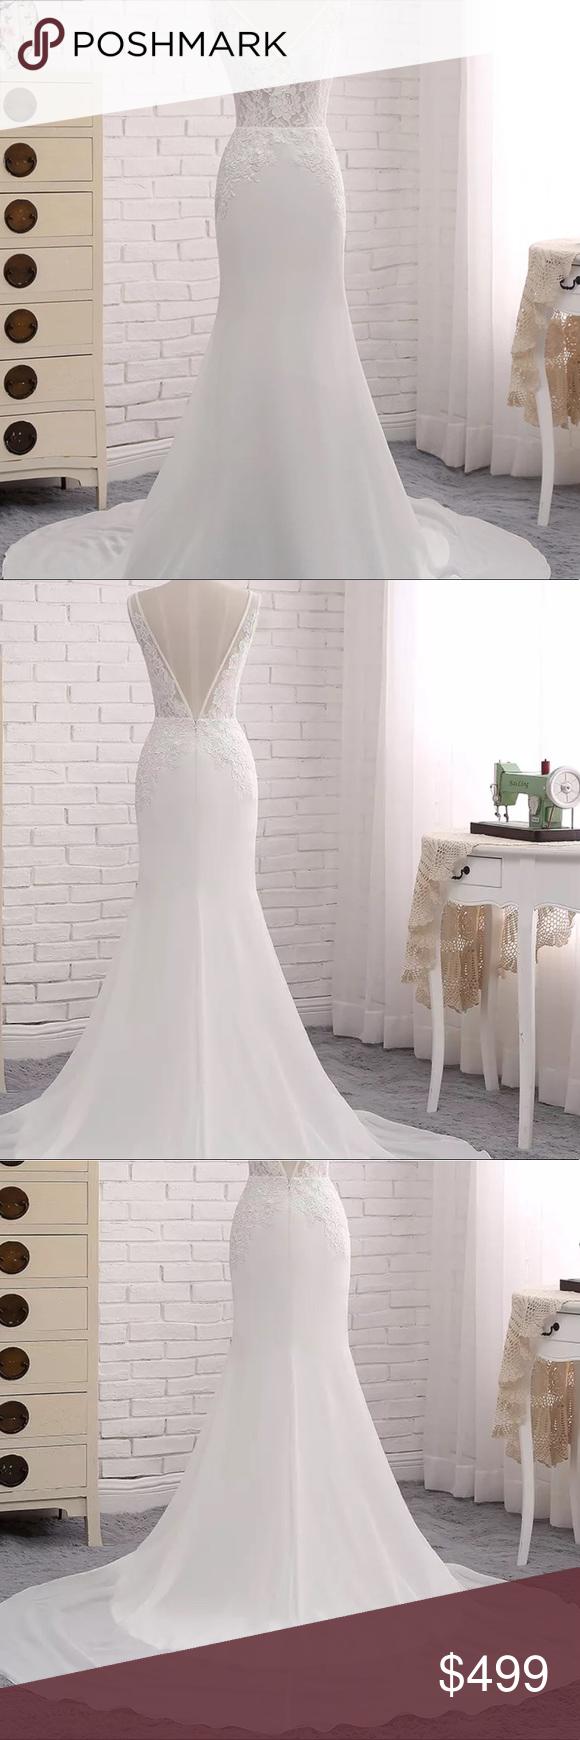 Bohemian lace flowy wedding dress nwt flowy wedding dresses